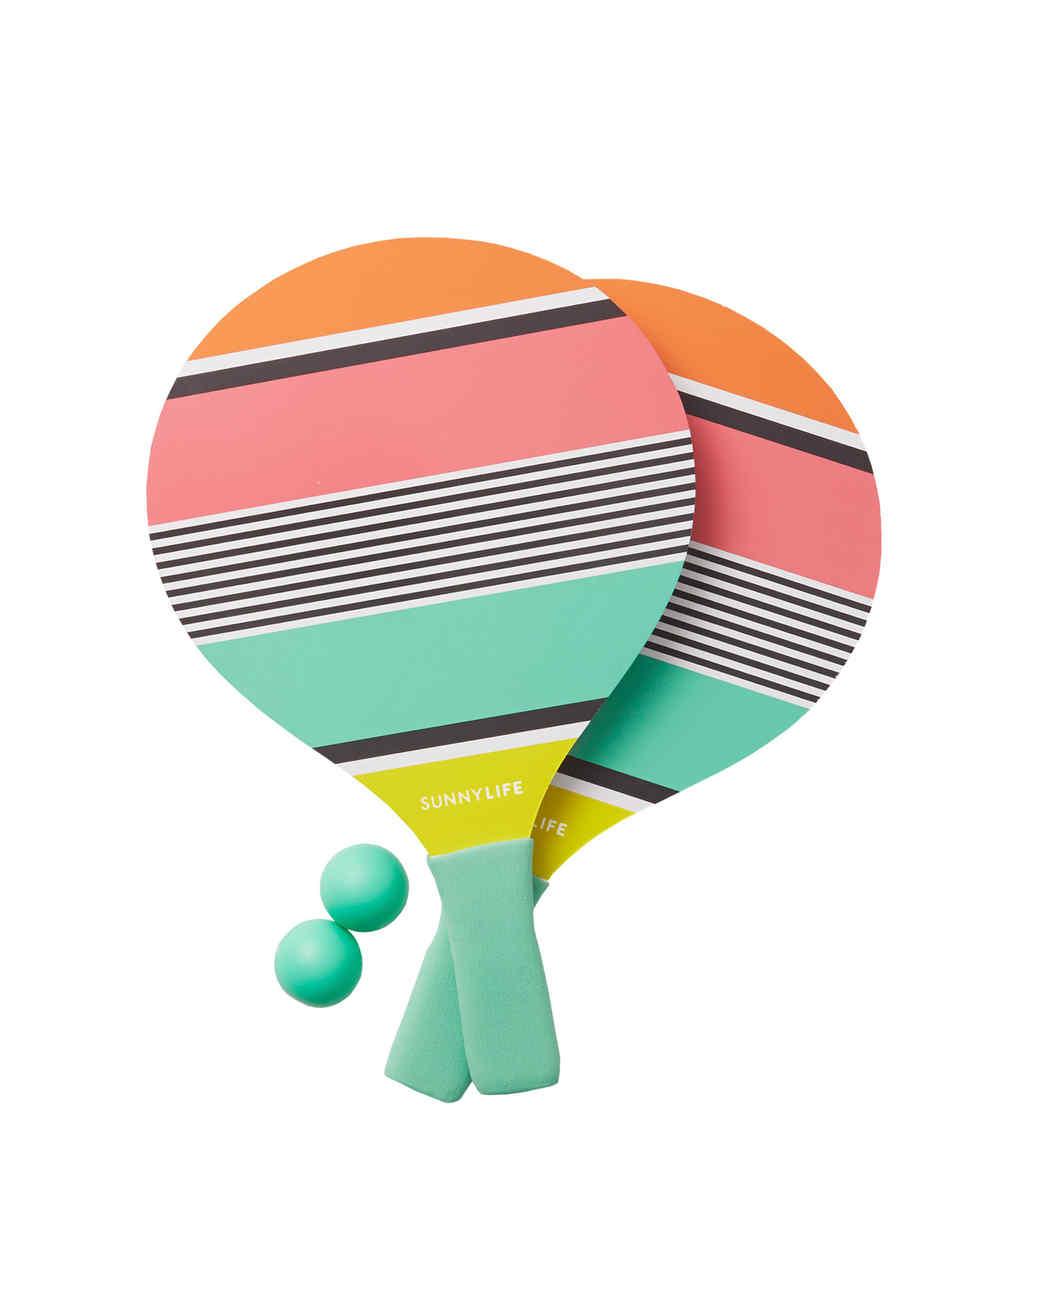 editors-picks-0816-beach-paddle-ball-261-d113014_l.jpg